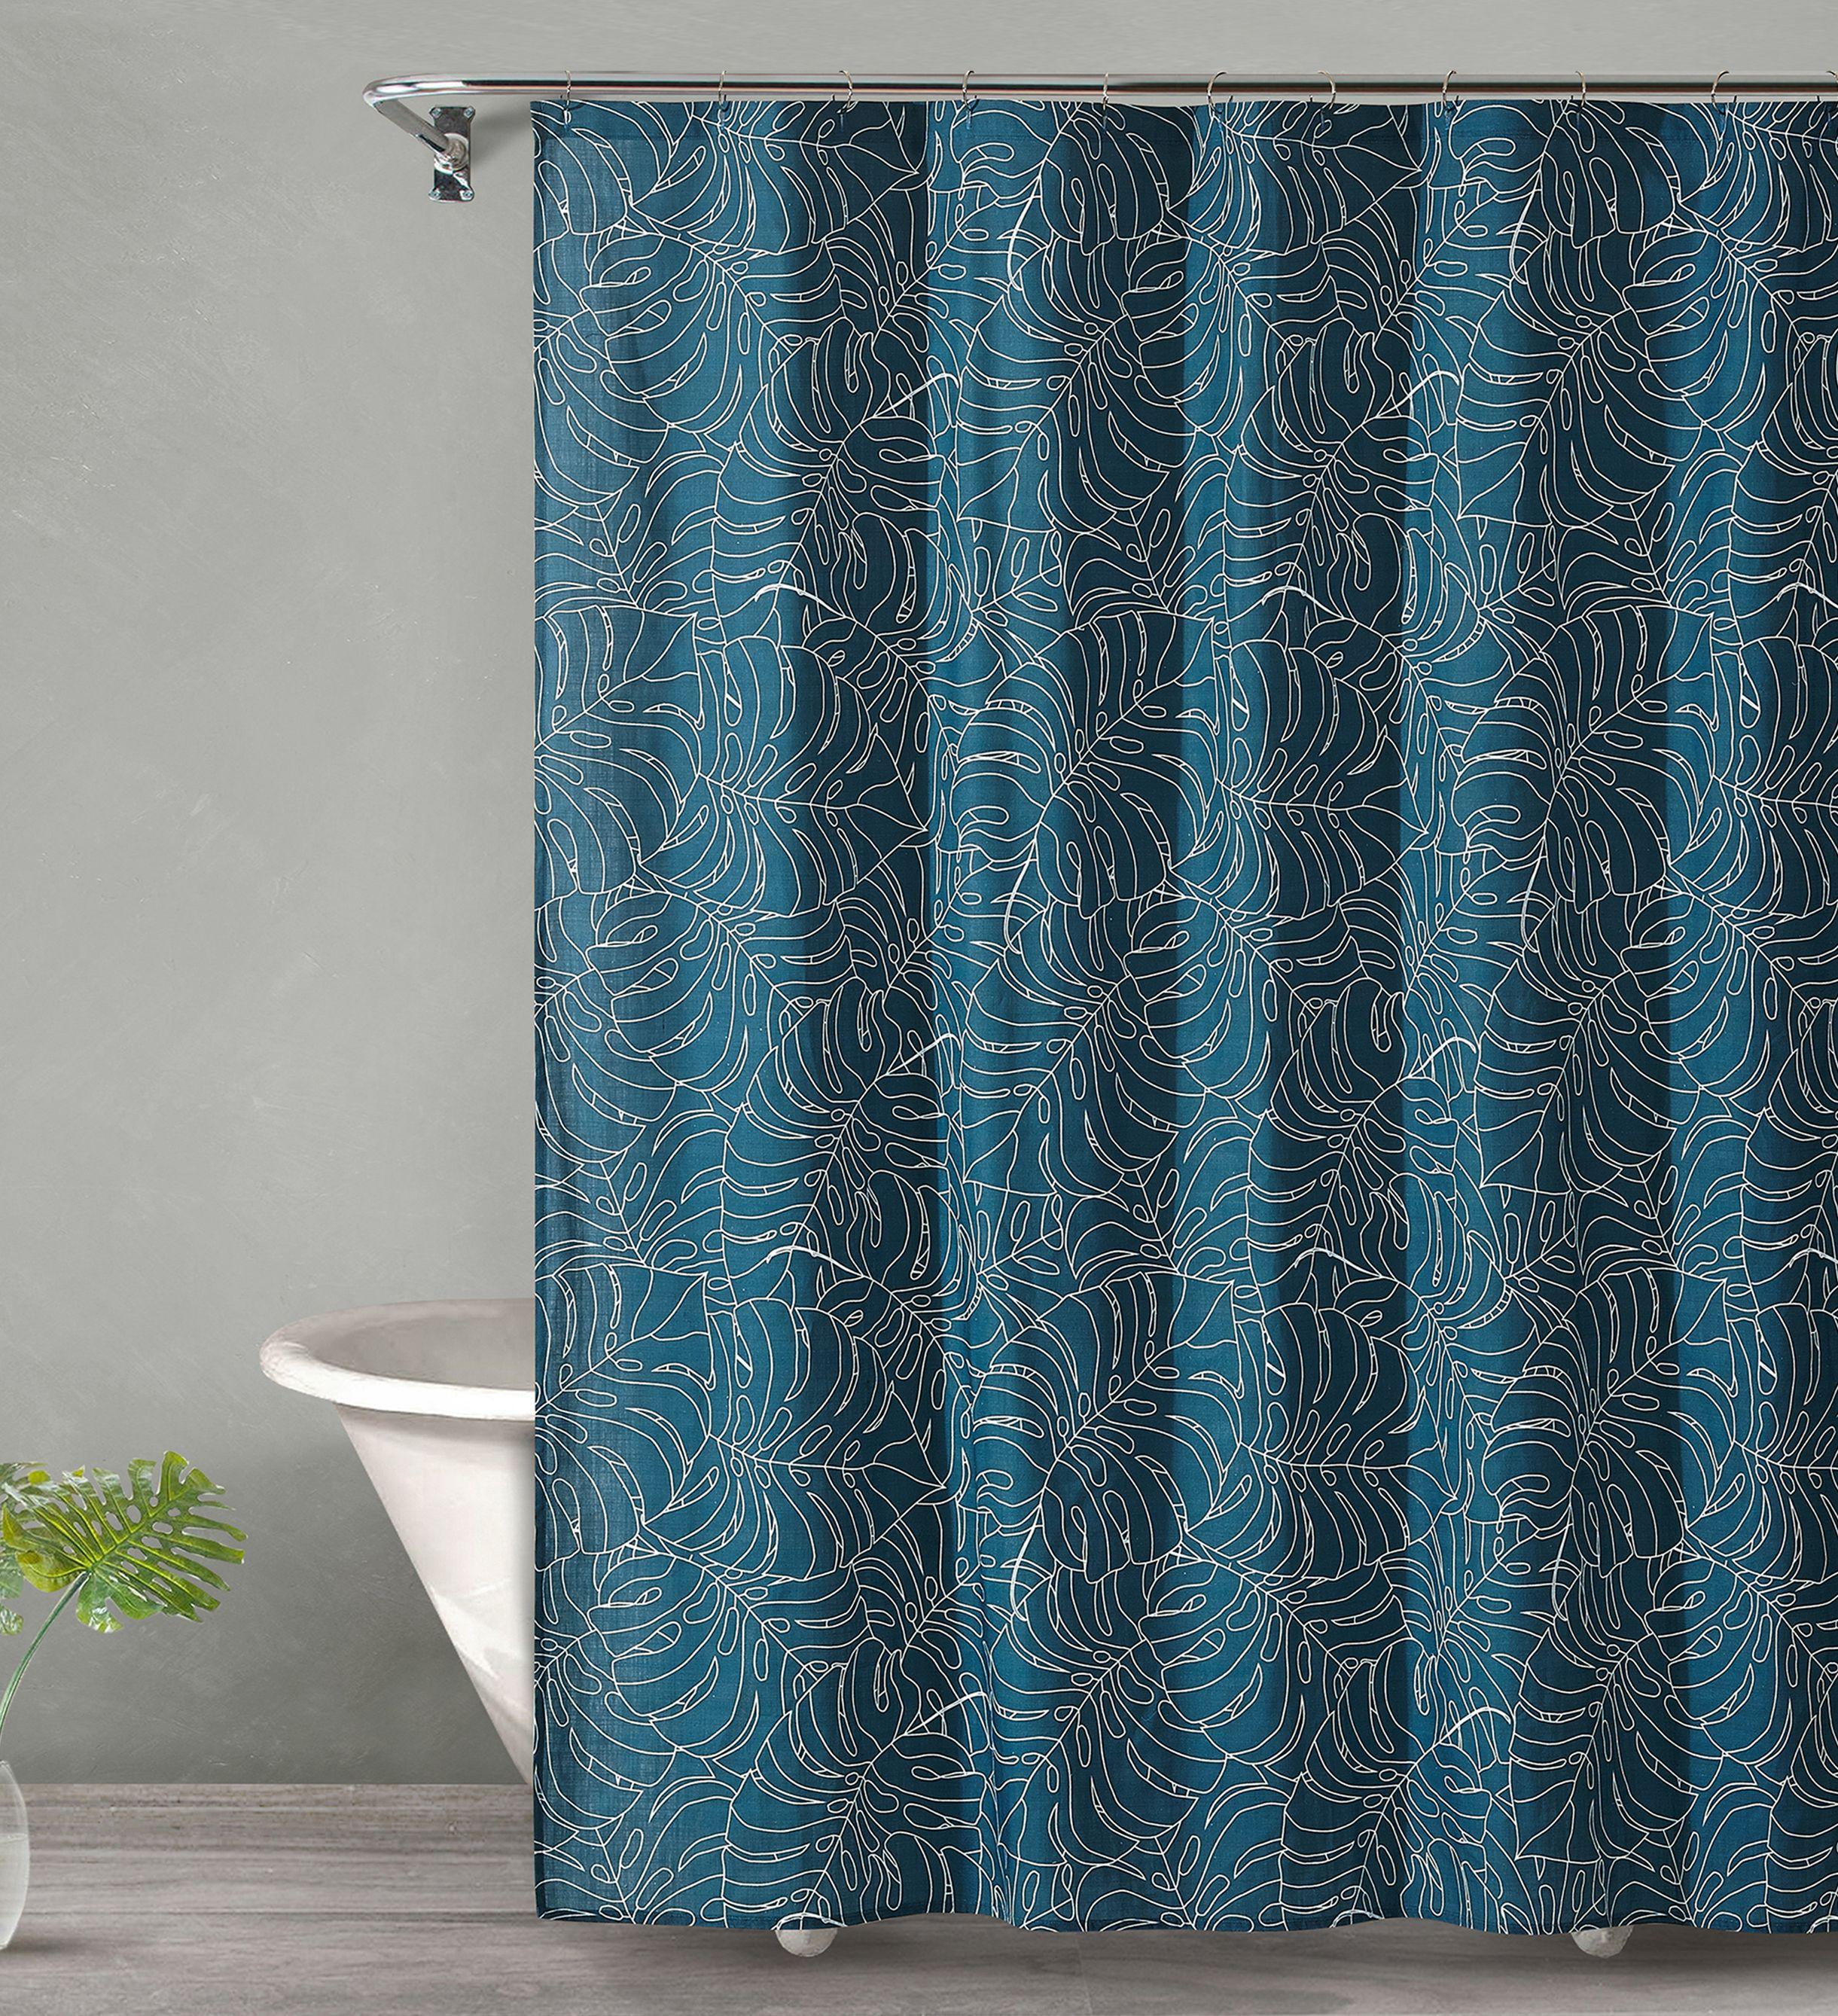 TROPICAL MIDNIGHT Shower Curtain 72x72